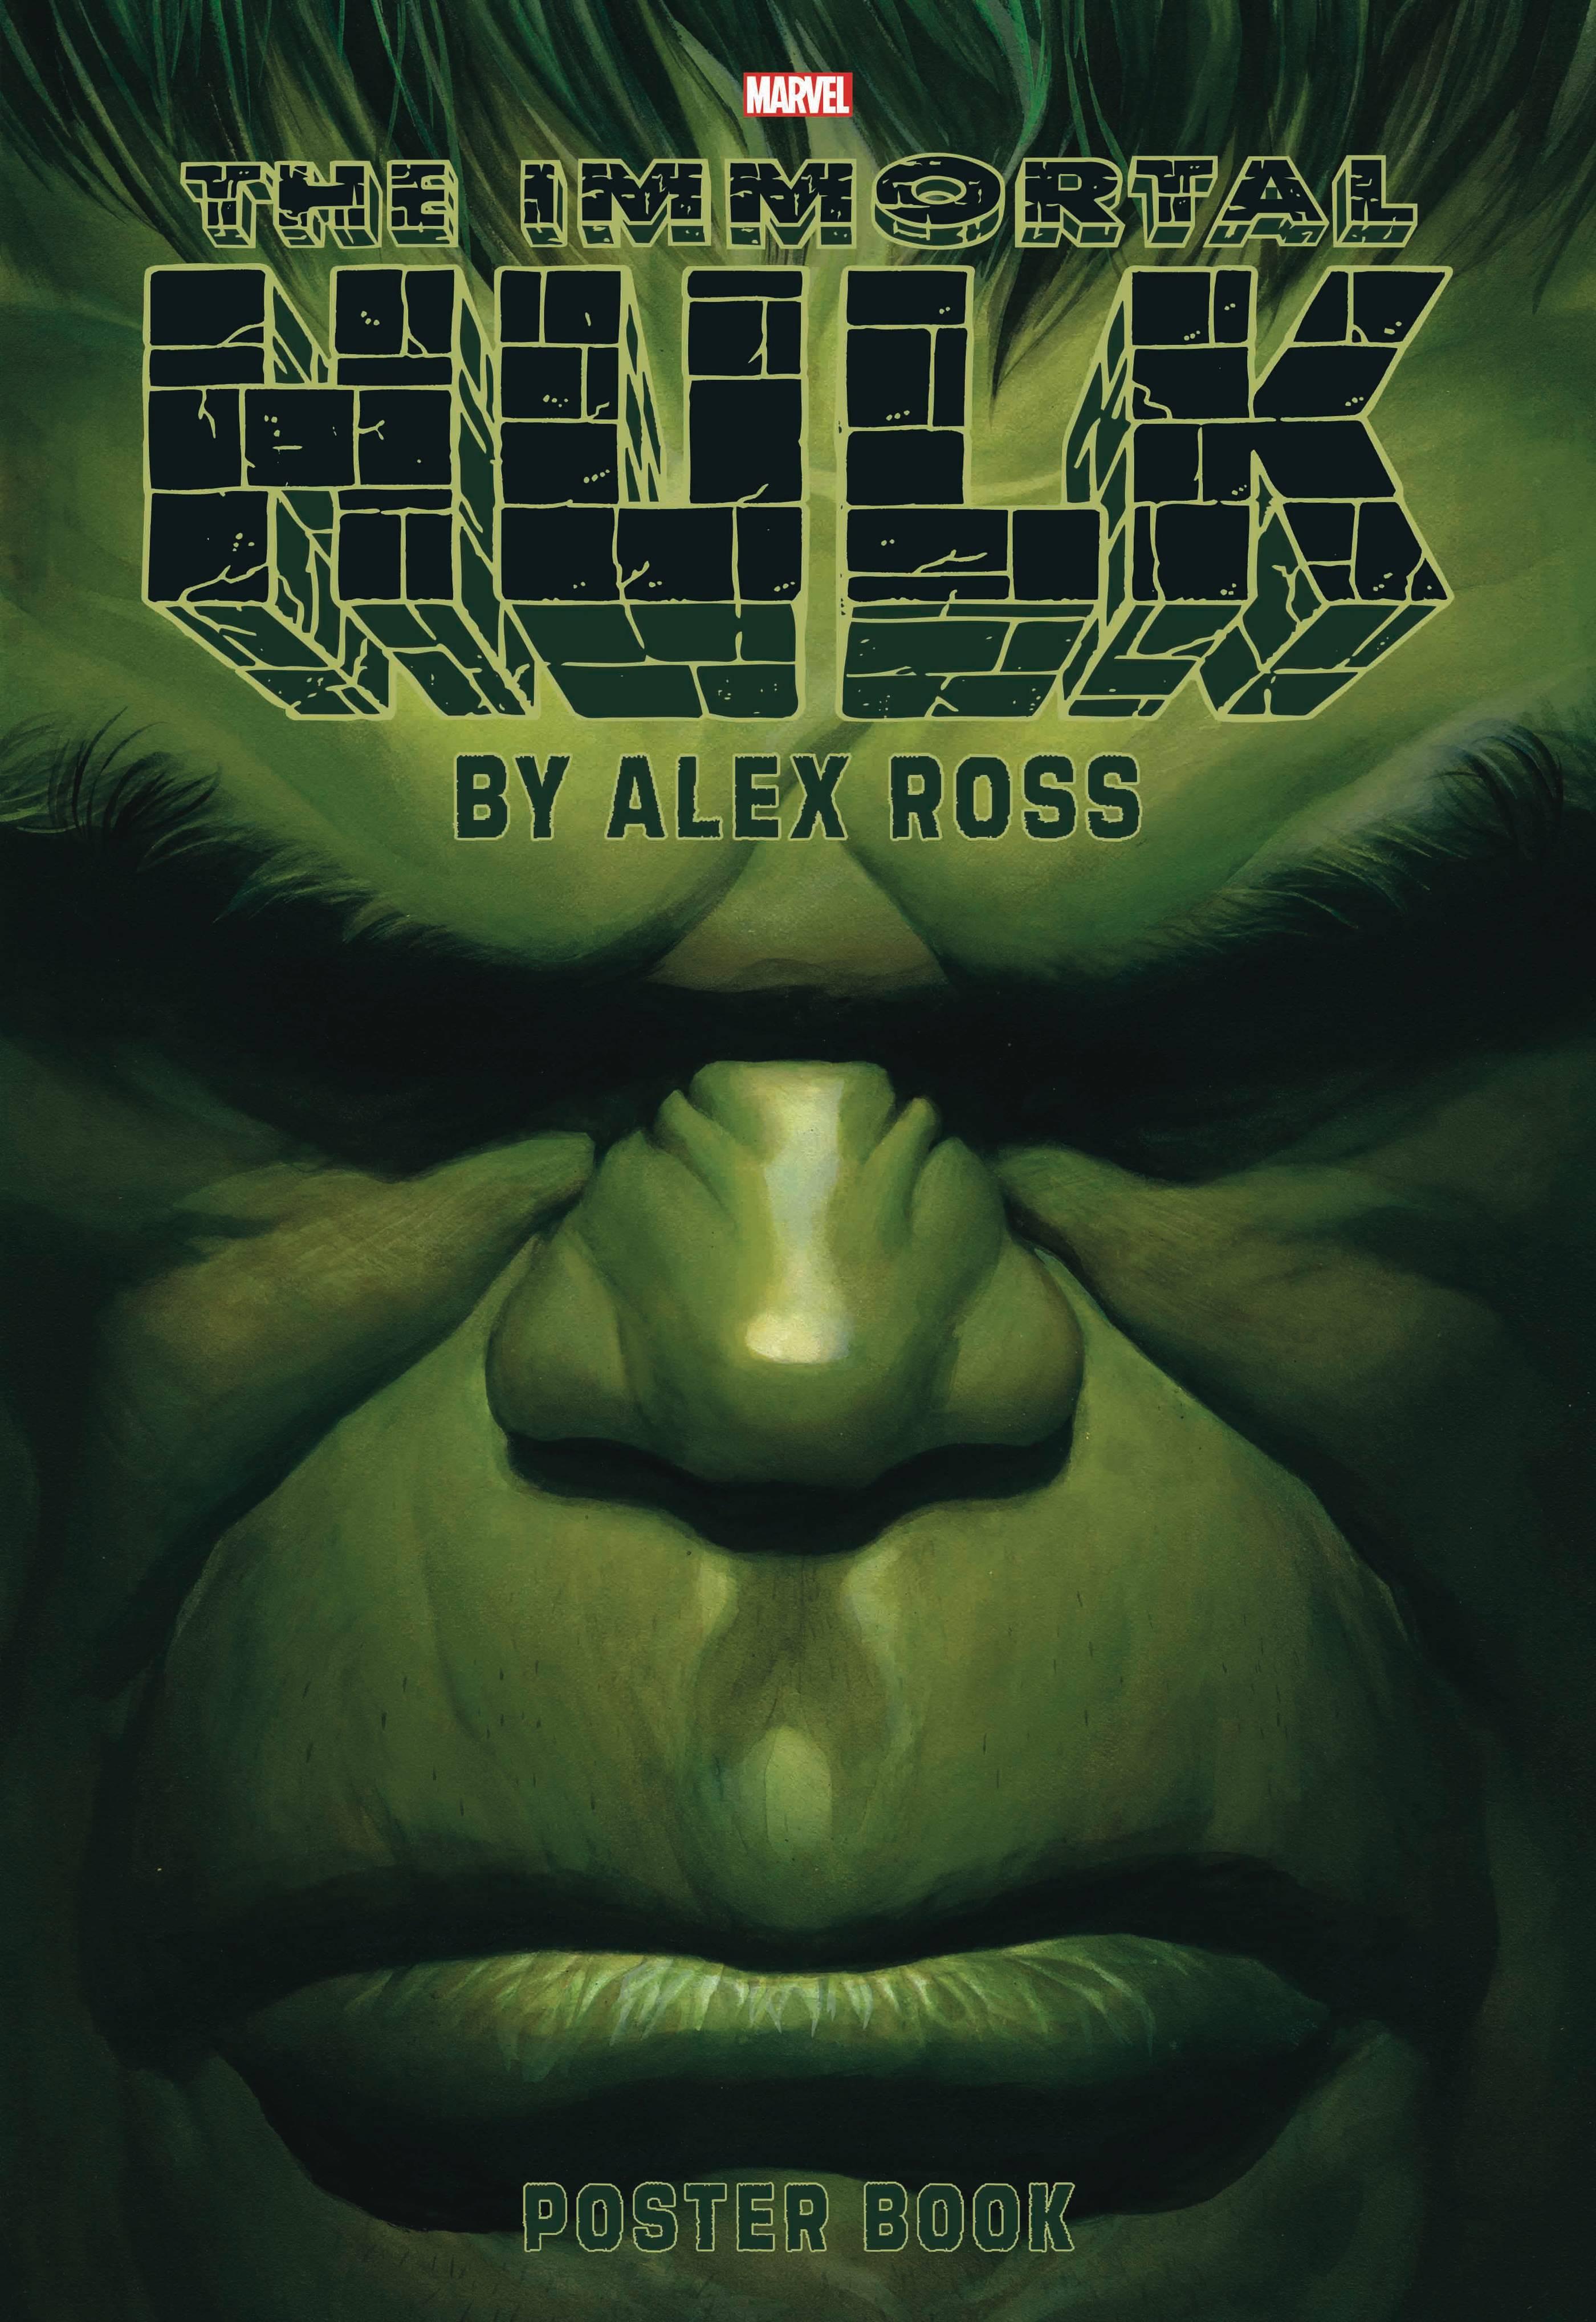 IMMORTAL HULK BY ALEX ROSS POSTER BOOK TP